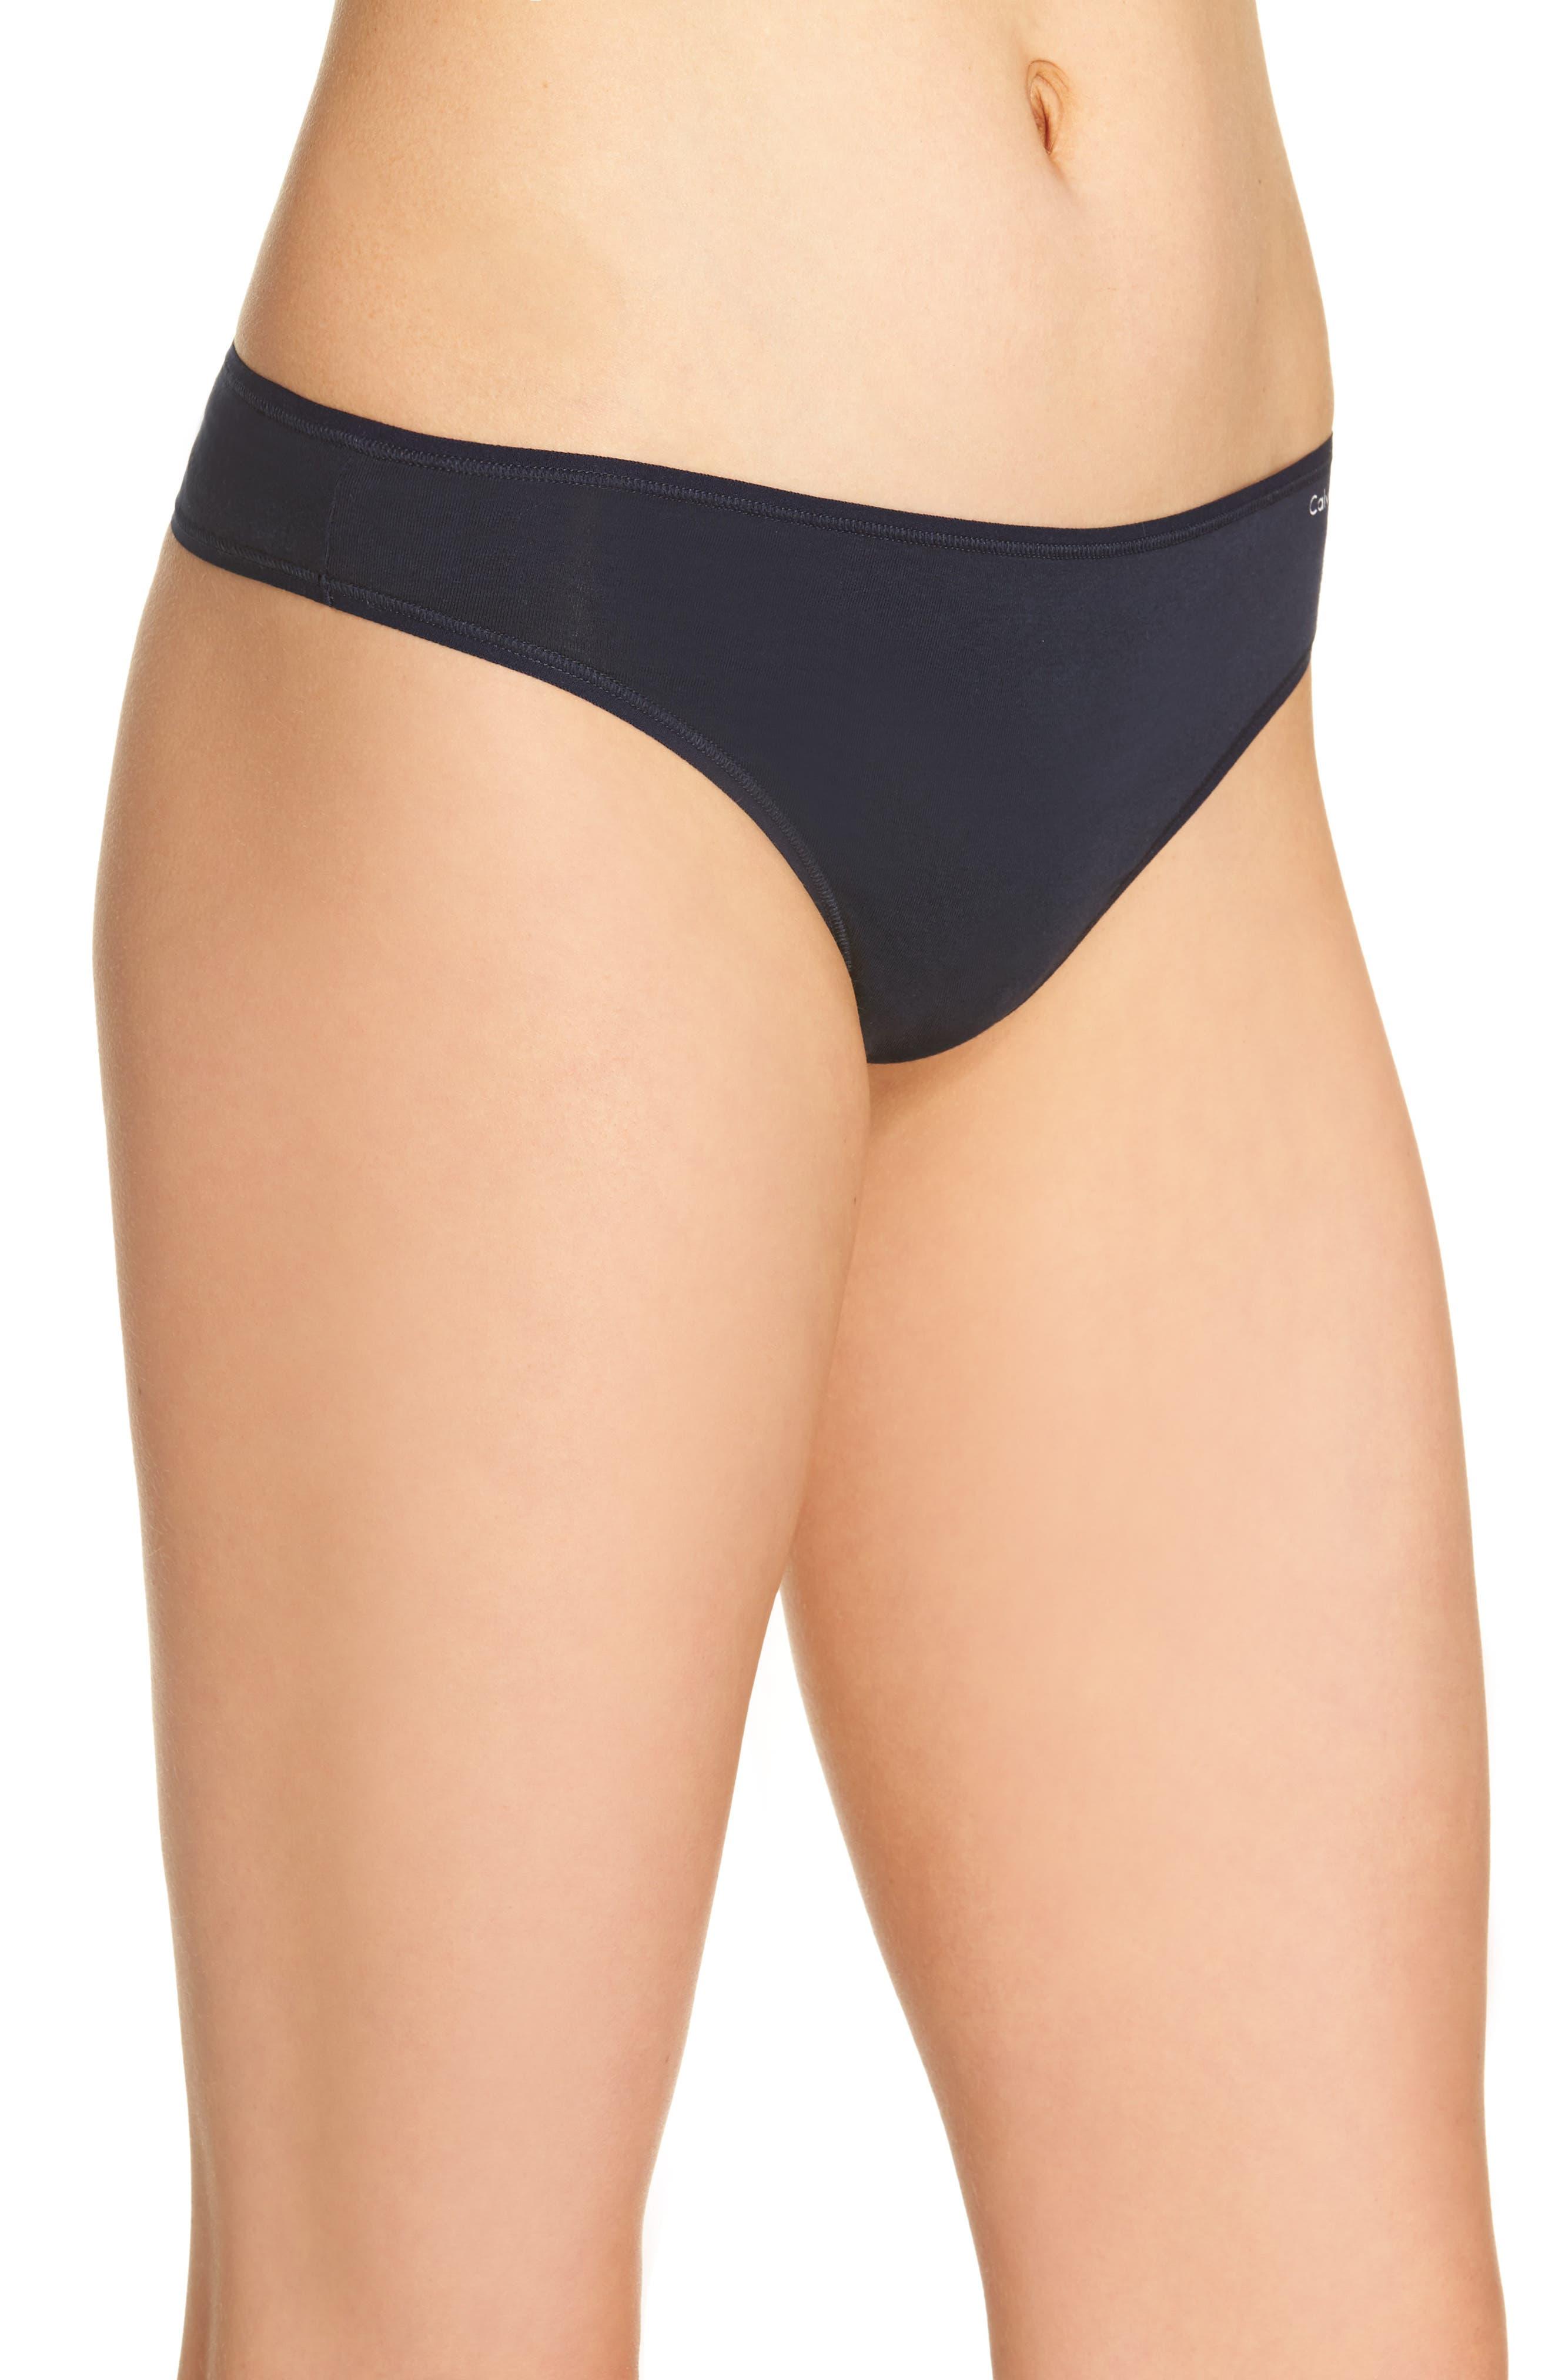 Alternate Image 3  - Calvin Klein Form Thong (3 for $33)